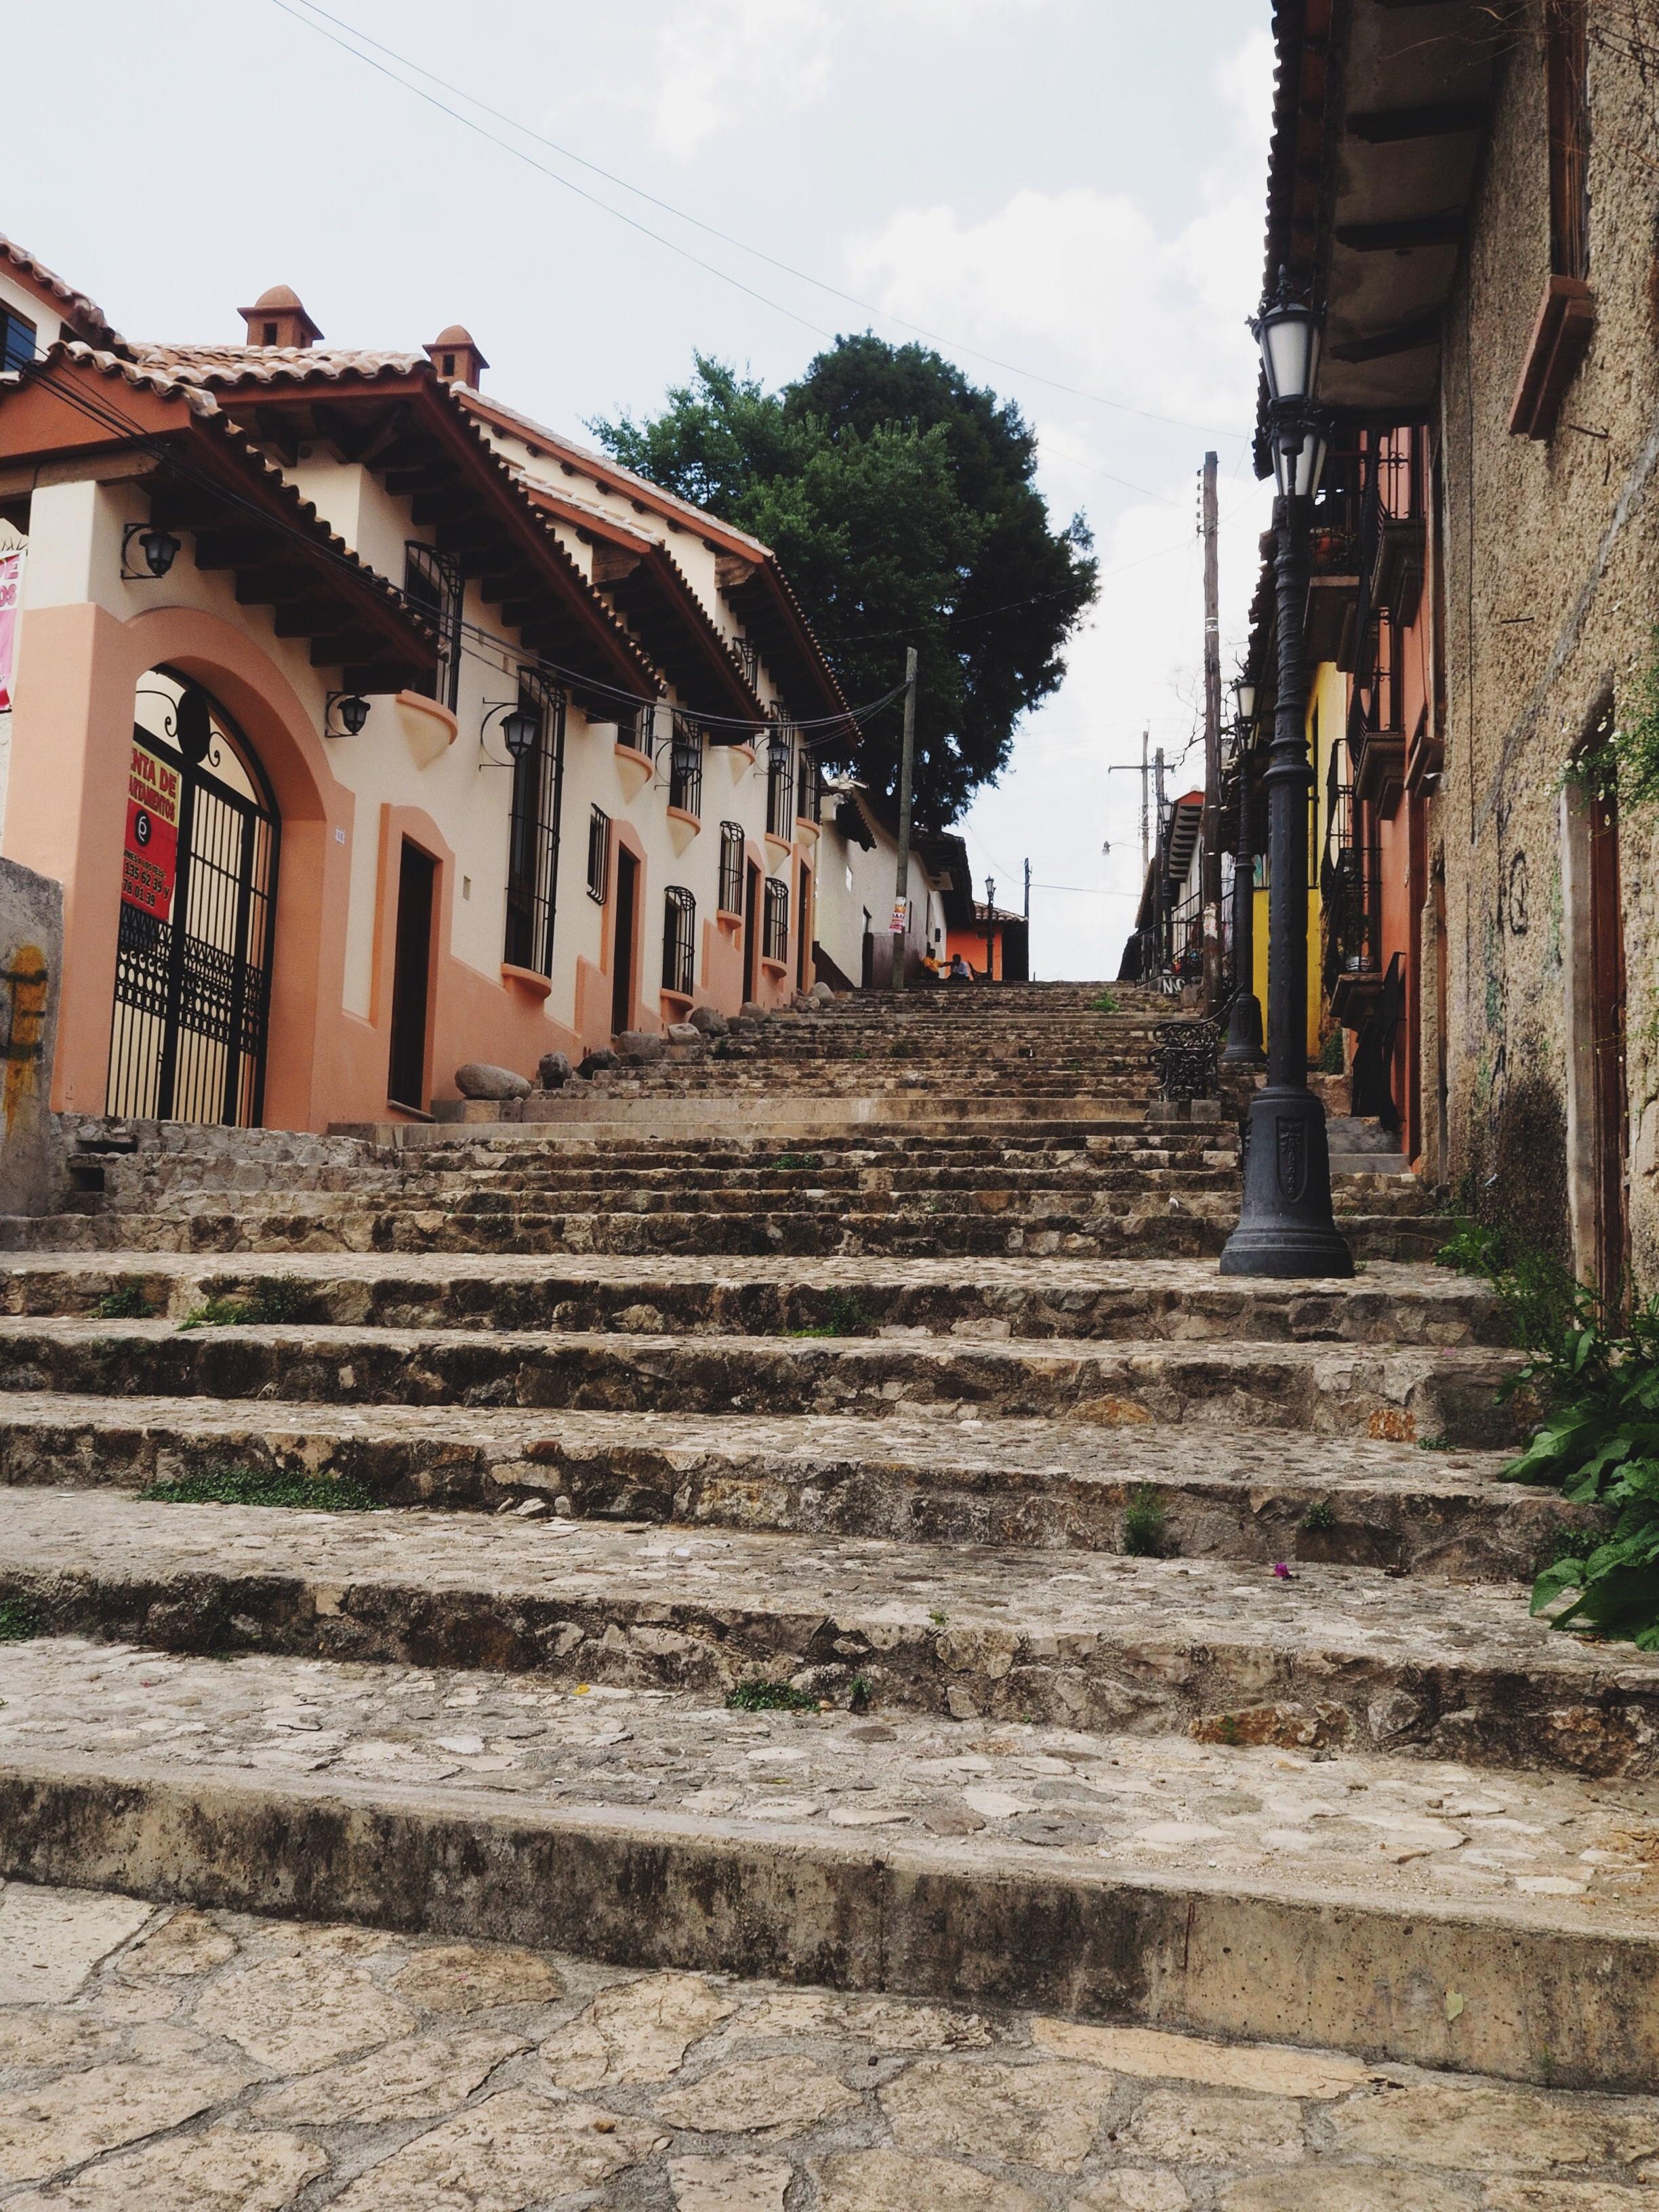 Streets and stairways of San Cristóbal